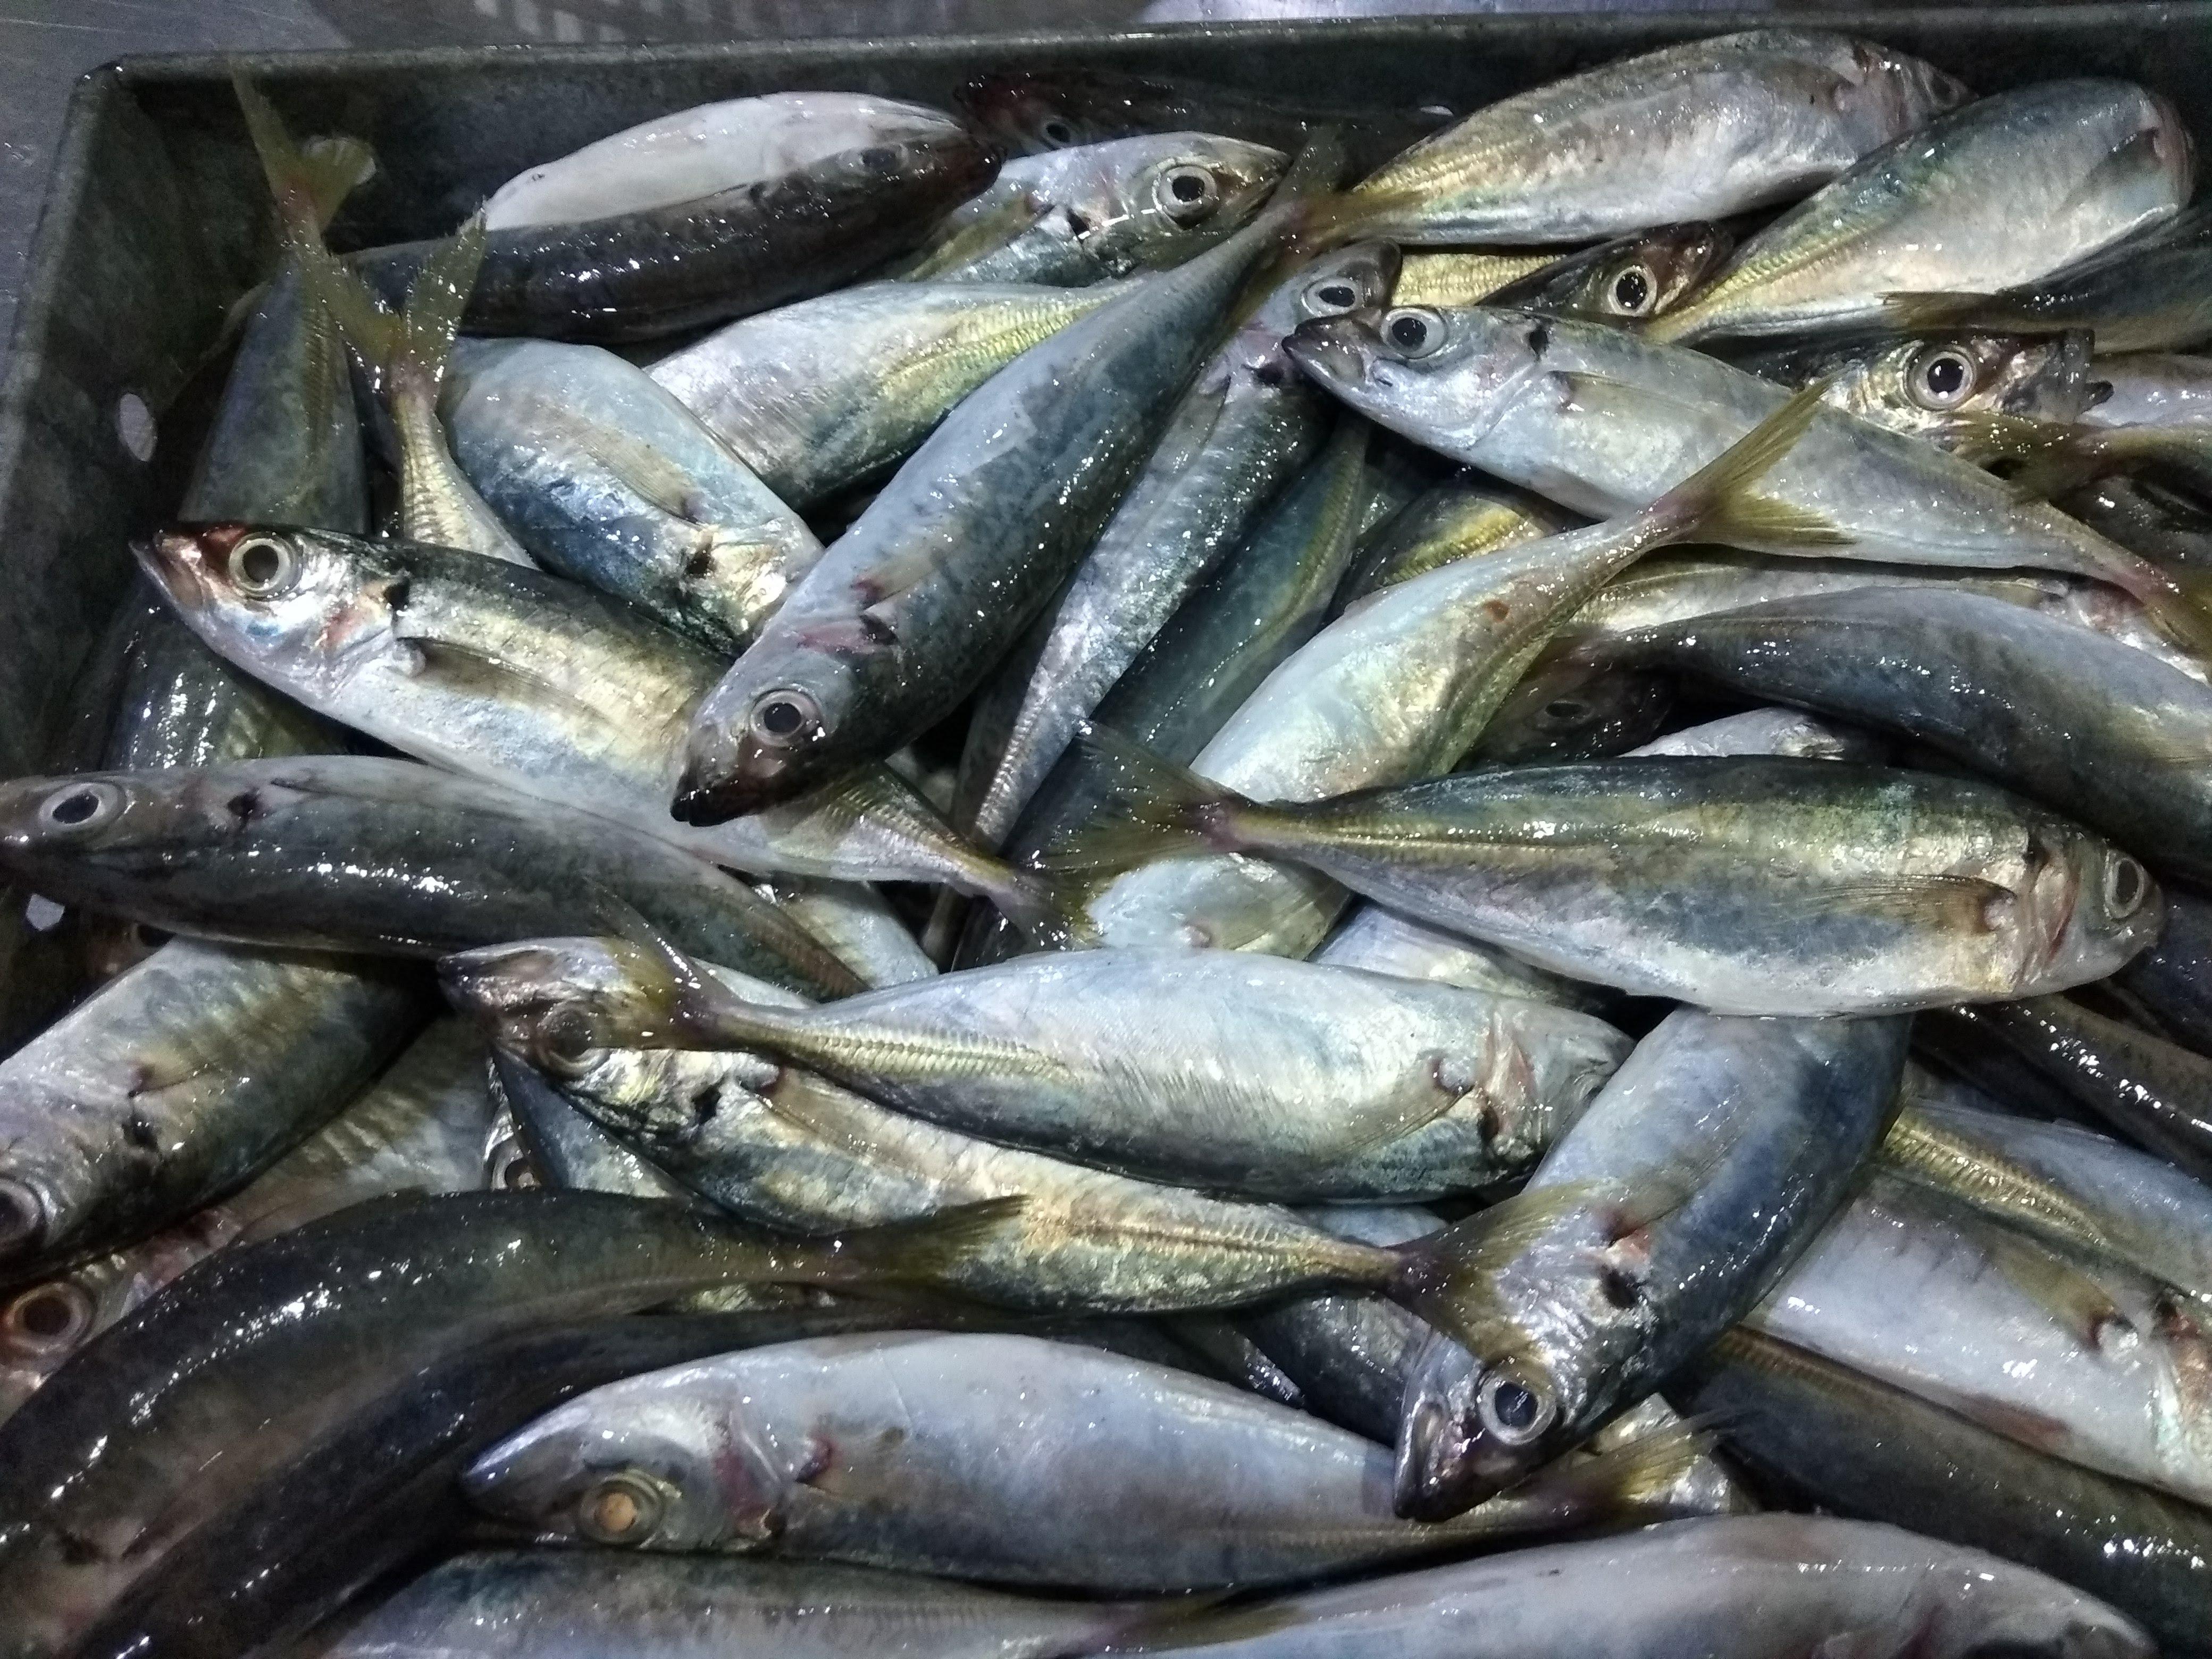 pinetreevietnam.com export company frozen seafood product